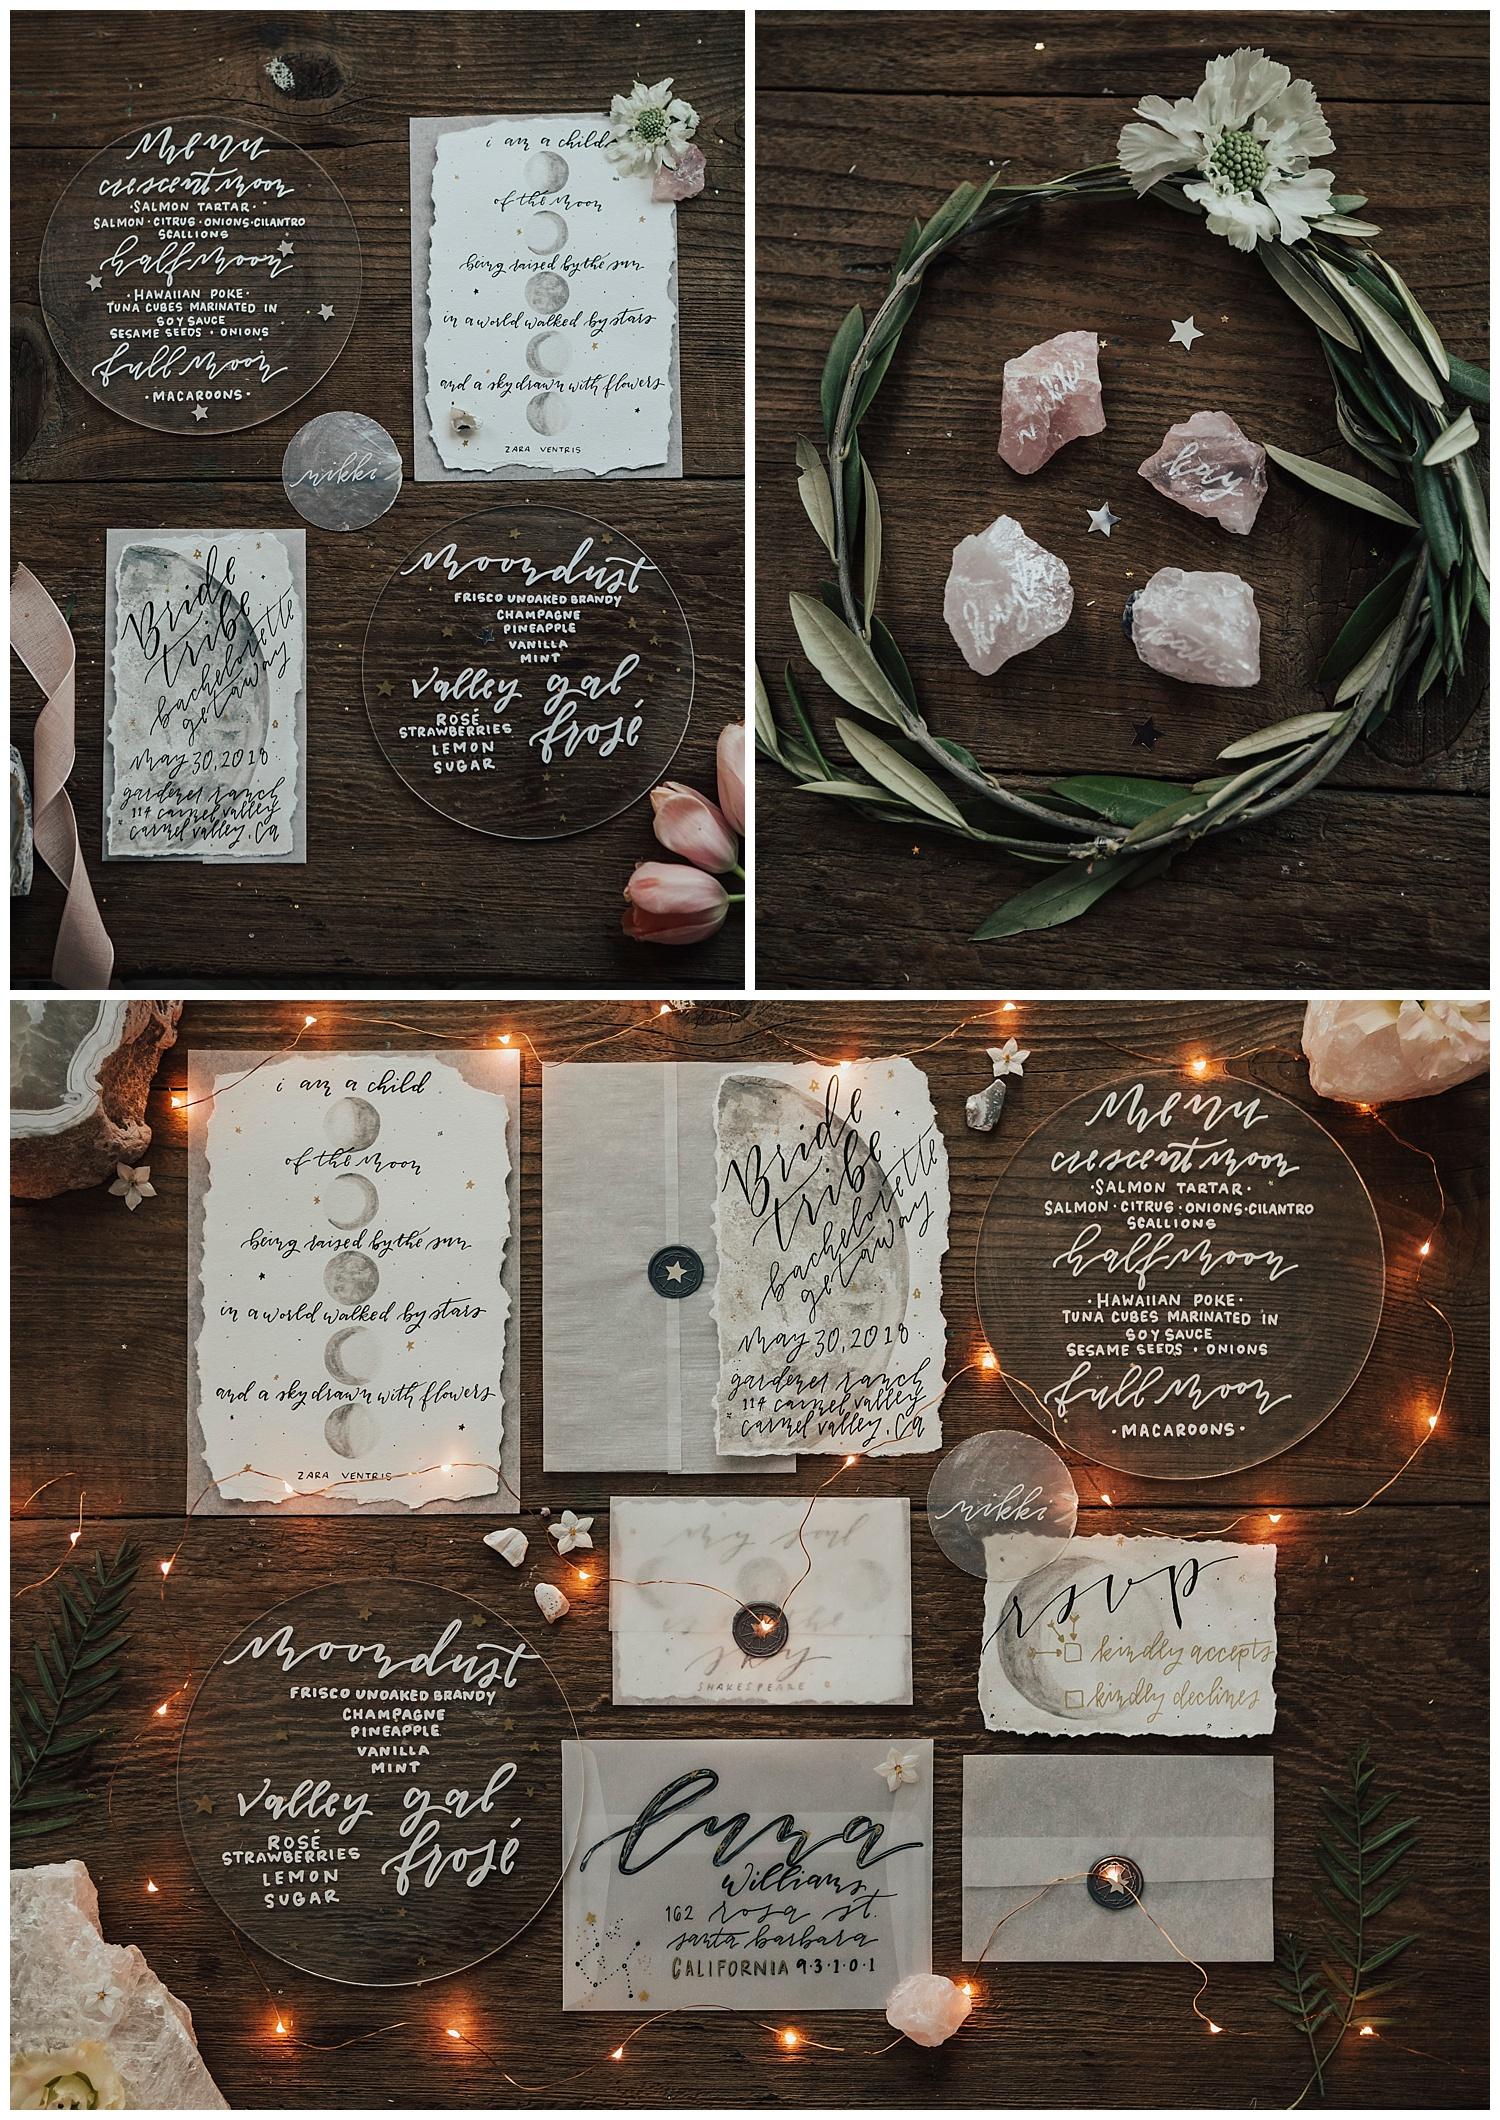 boho-wedding-invitatios-caligraphy.jpg